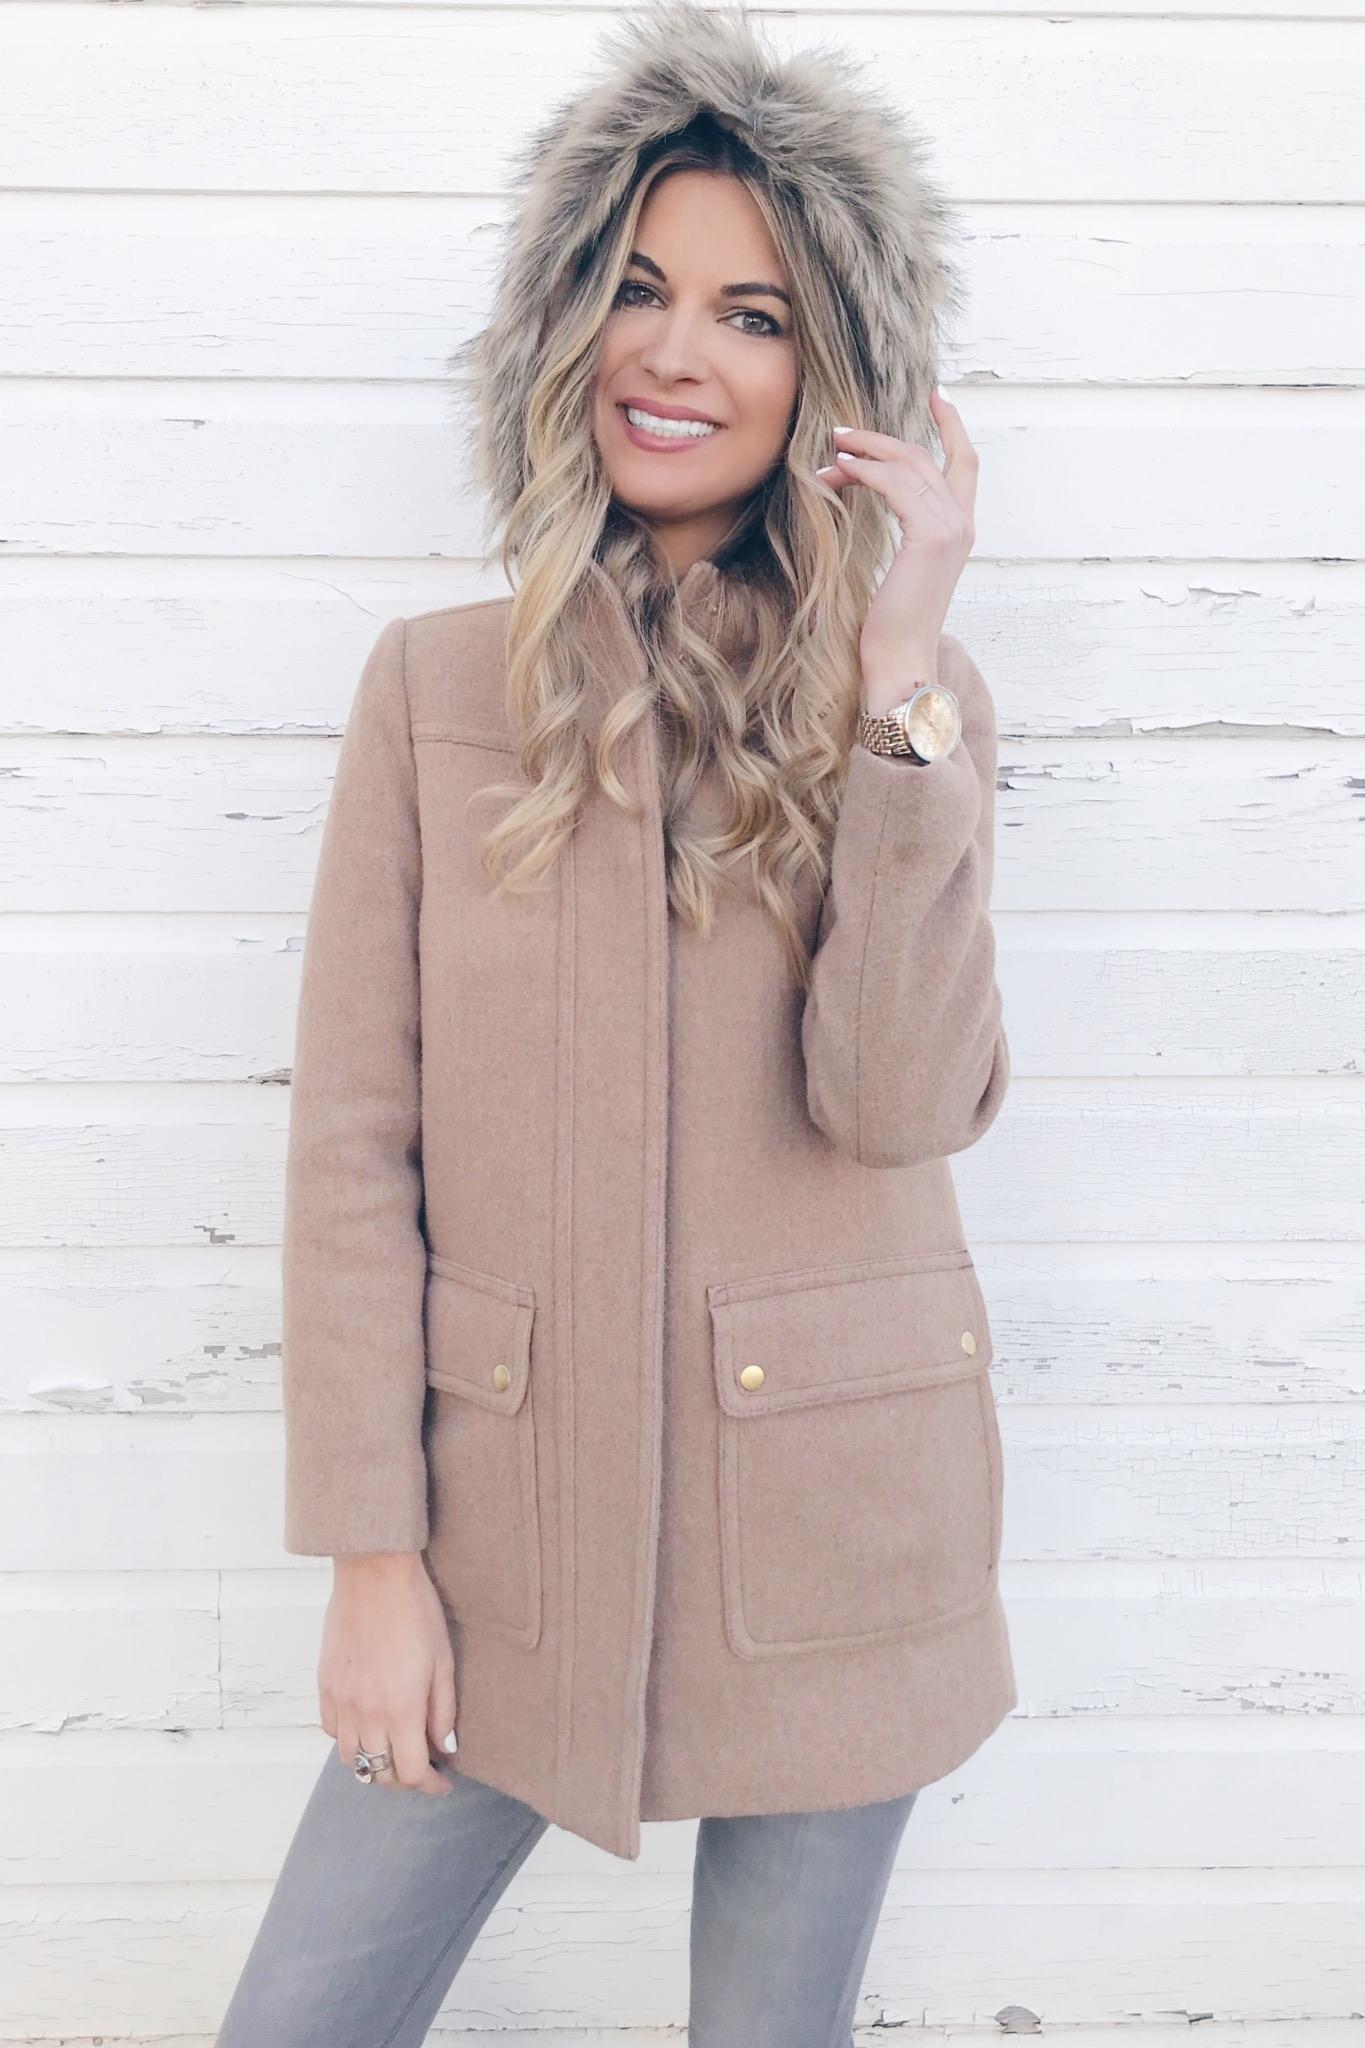 veteran's day sale round up - women's faux fur trim hooded camel coat